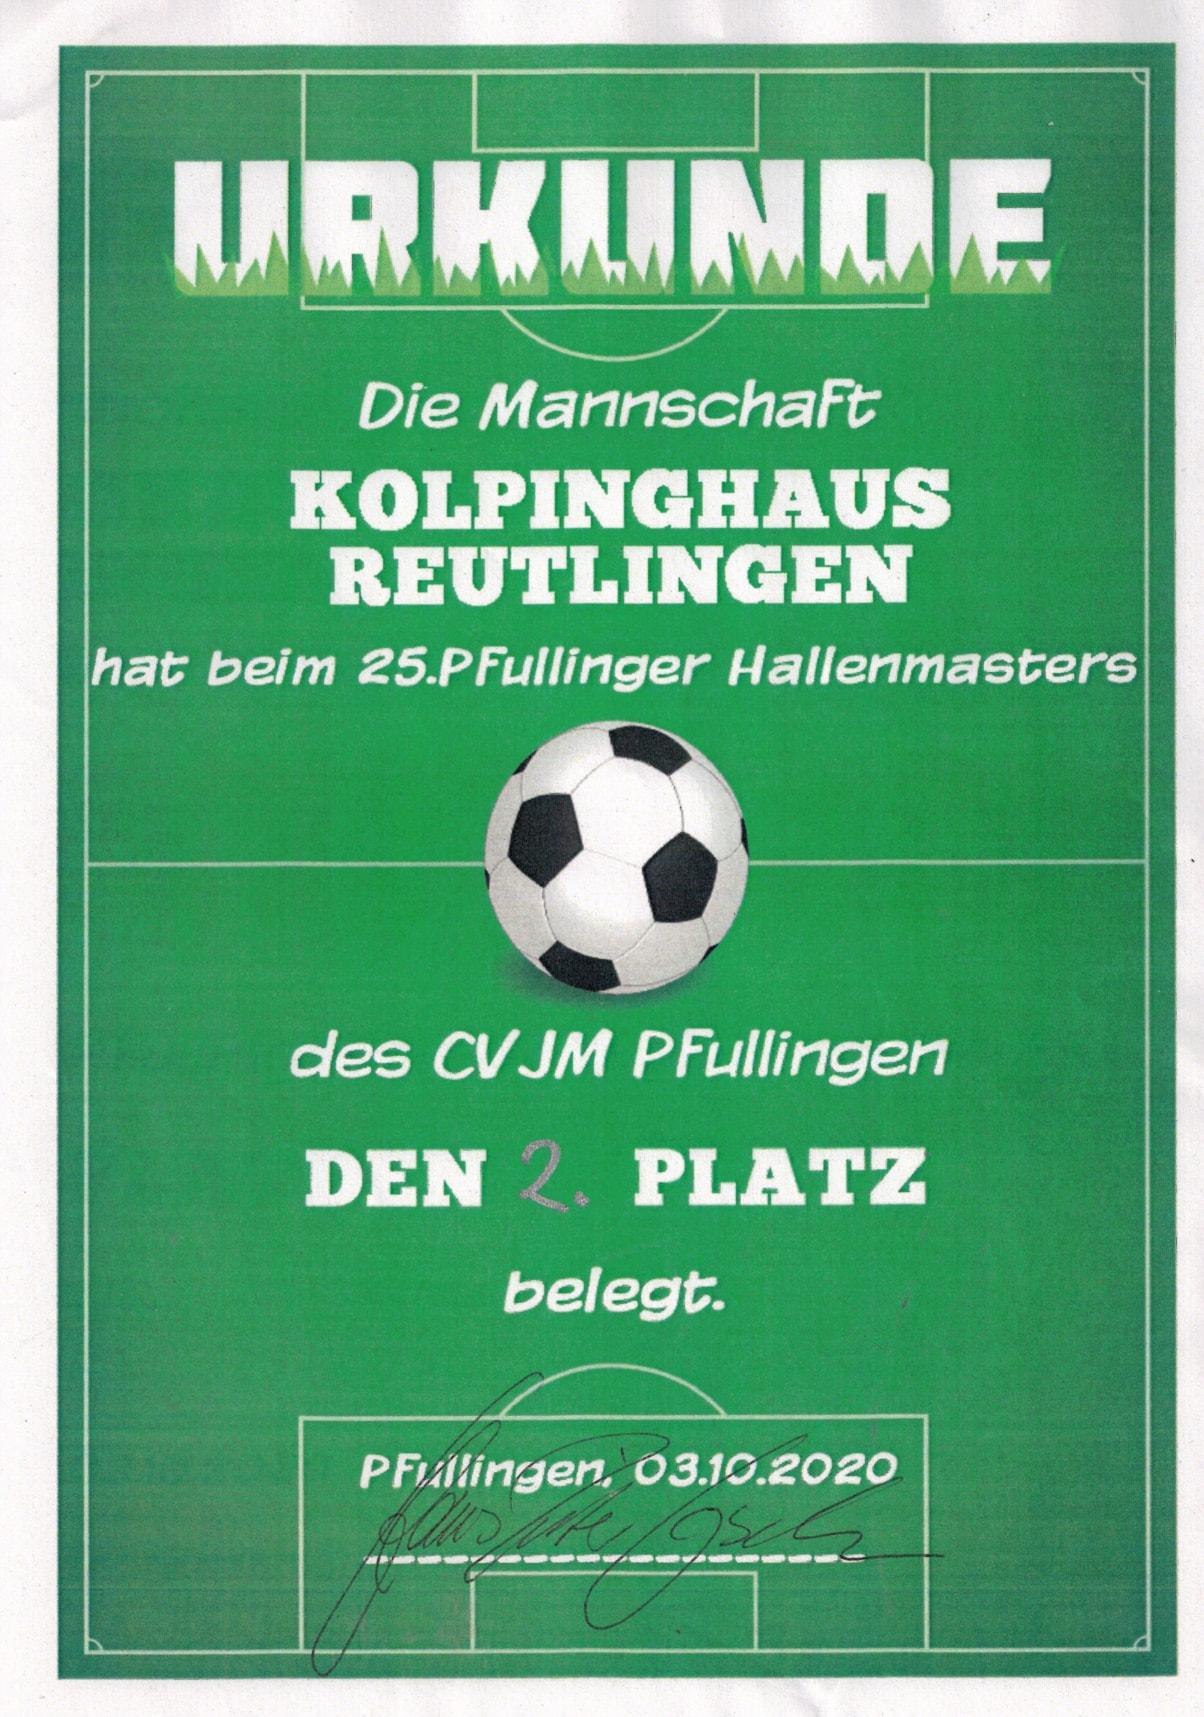 2020-10-06-kolpinghaus-team-holt-2-Platz-beim-pfullinger-hallenmasters-4.jpg